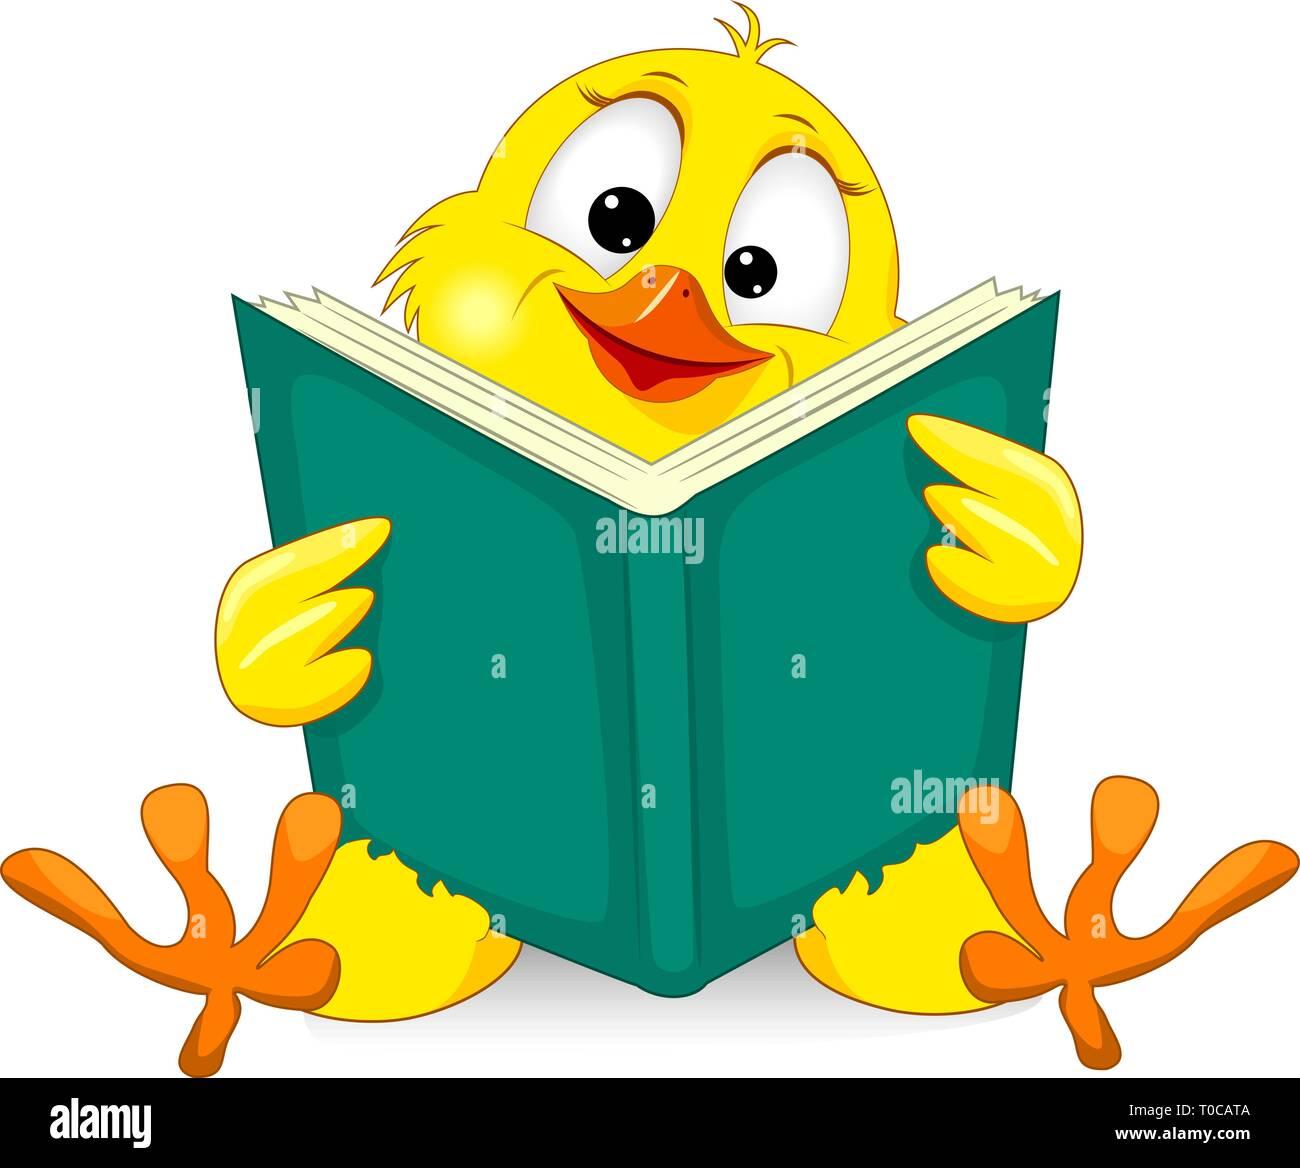 Poco Amarillo Pollo Con Un Libro Pollito De Dibujos